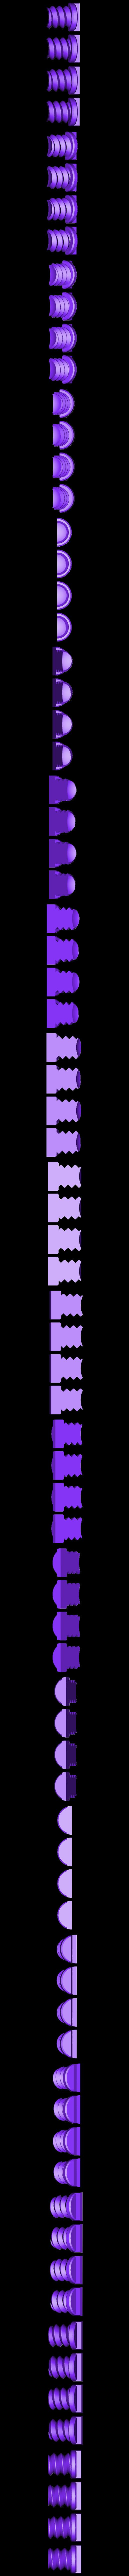 51_Drag_Leg2_HipScrew_GREY.stl Download STL file ARTICULATED DRAGONLORD (not Dragonzord) - NO SUPPORT • 3D printer model, Toymakr3D